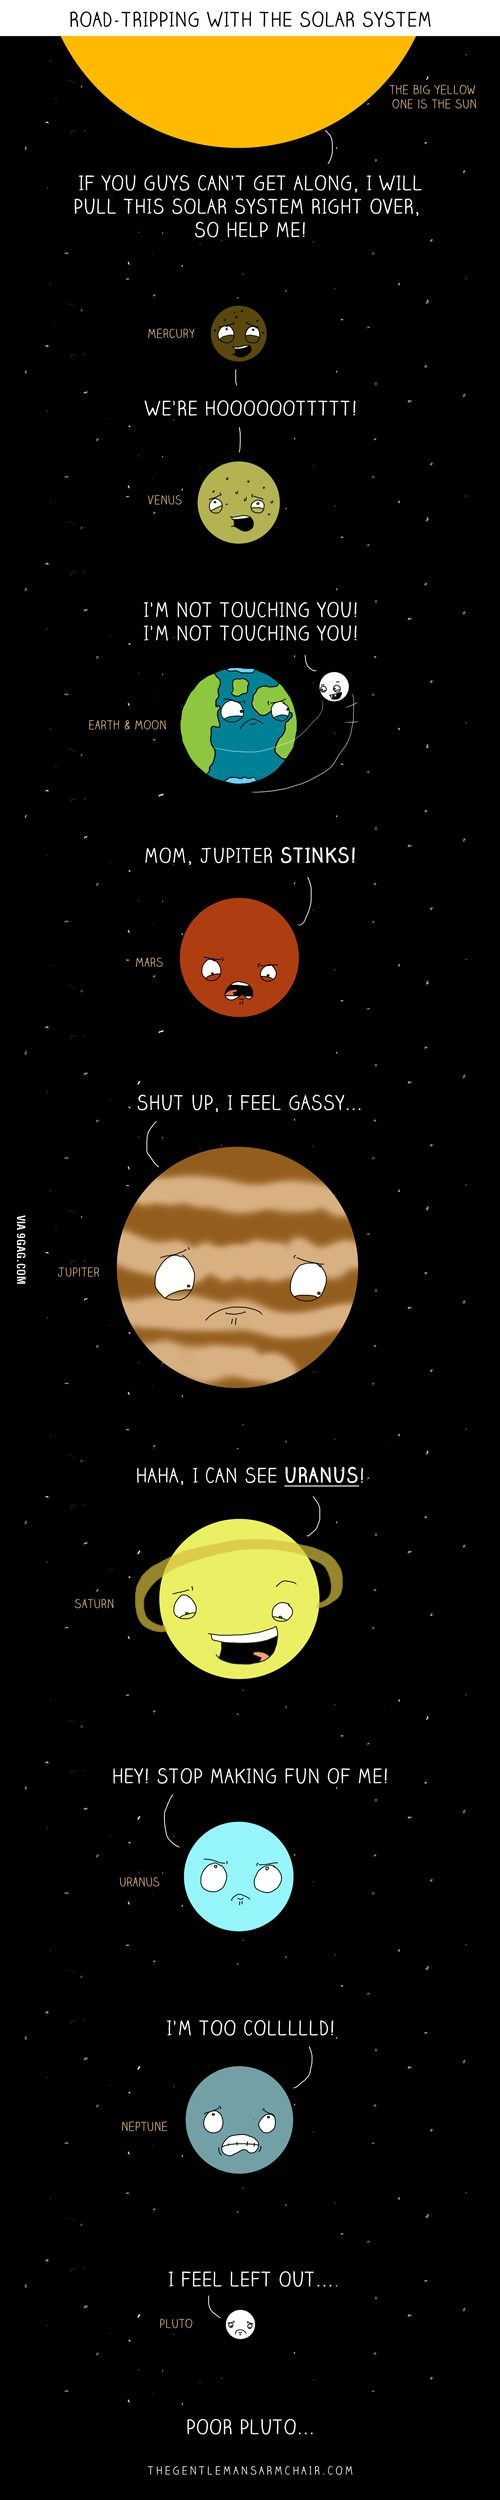 silly meme solar system - photo #41